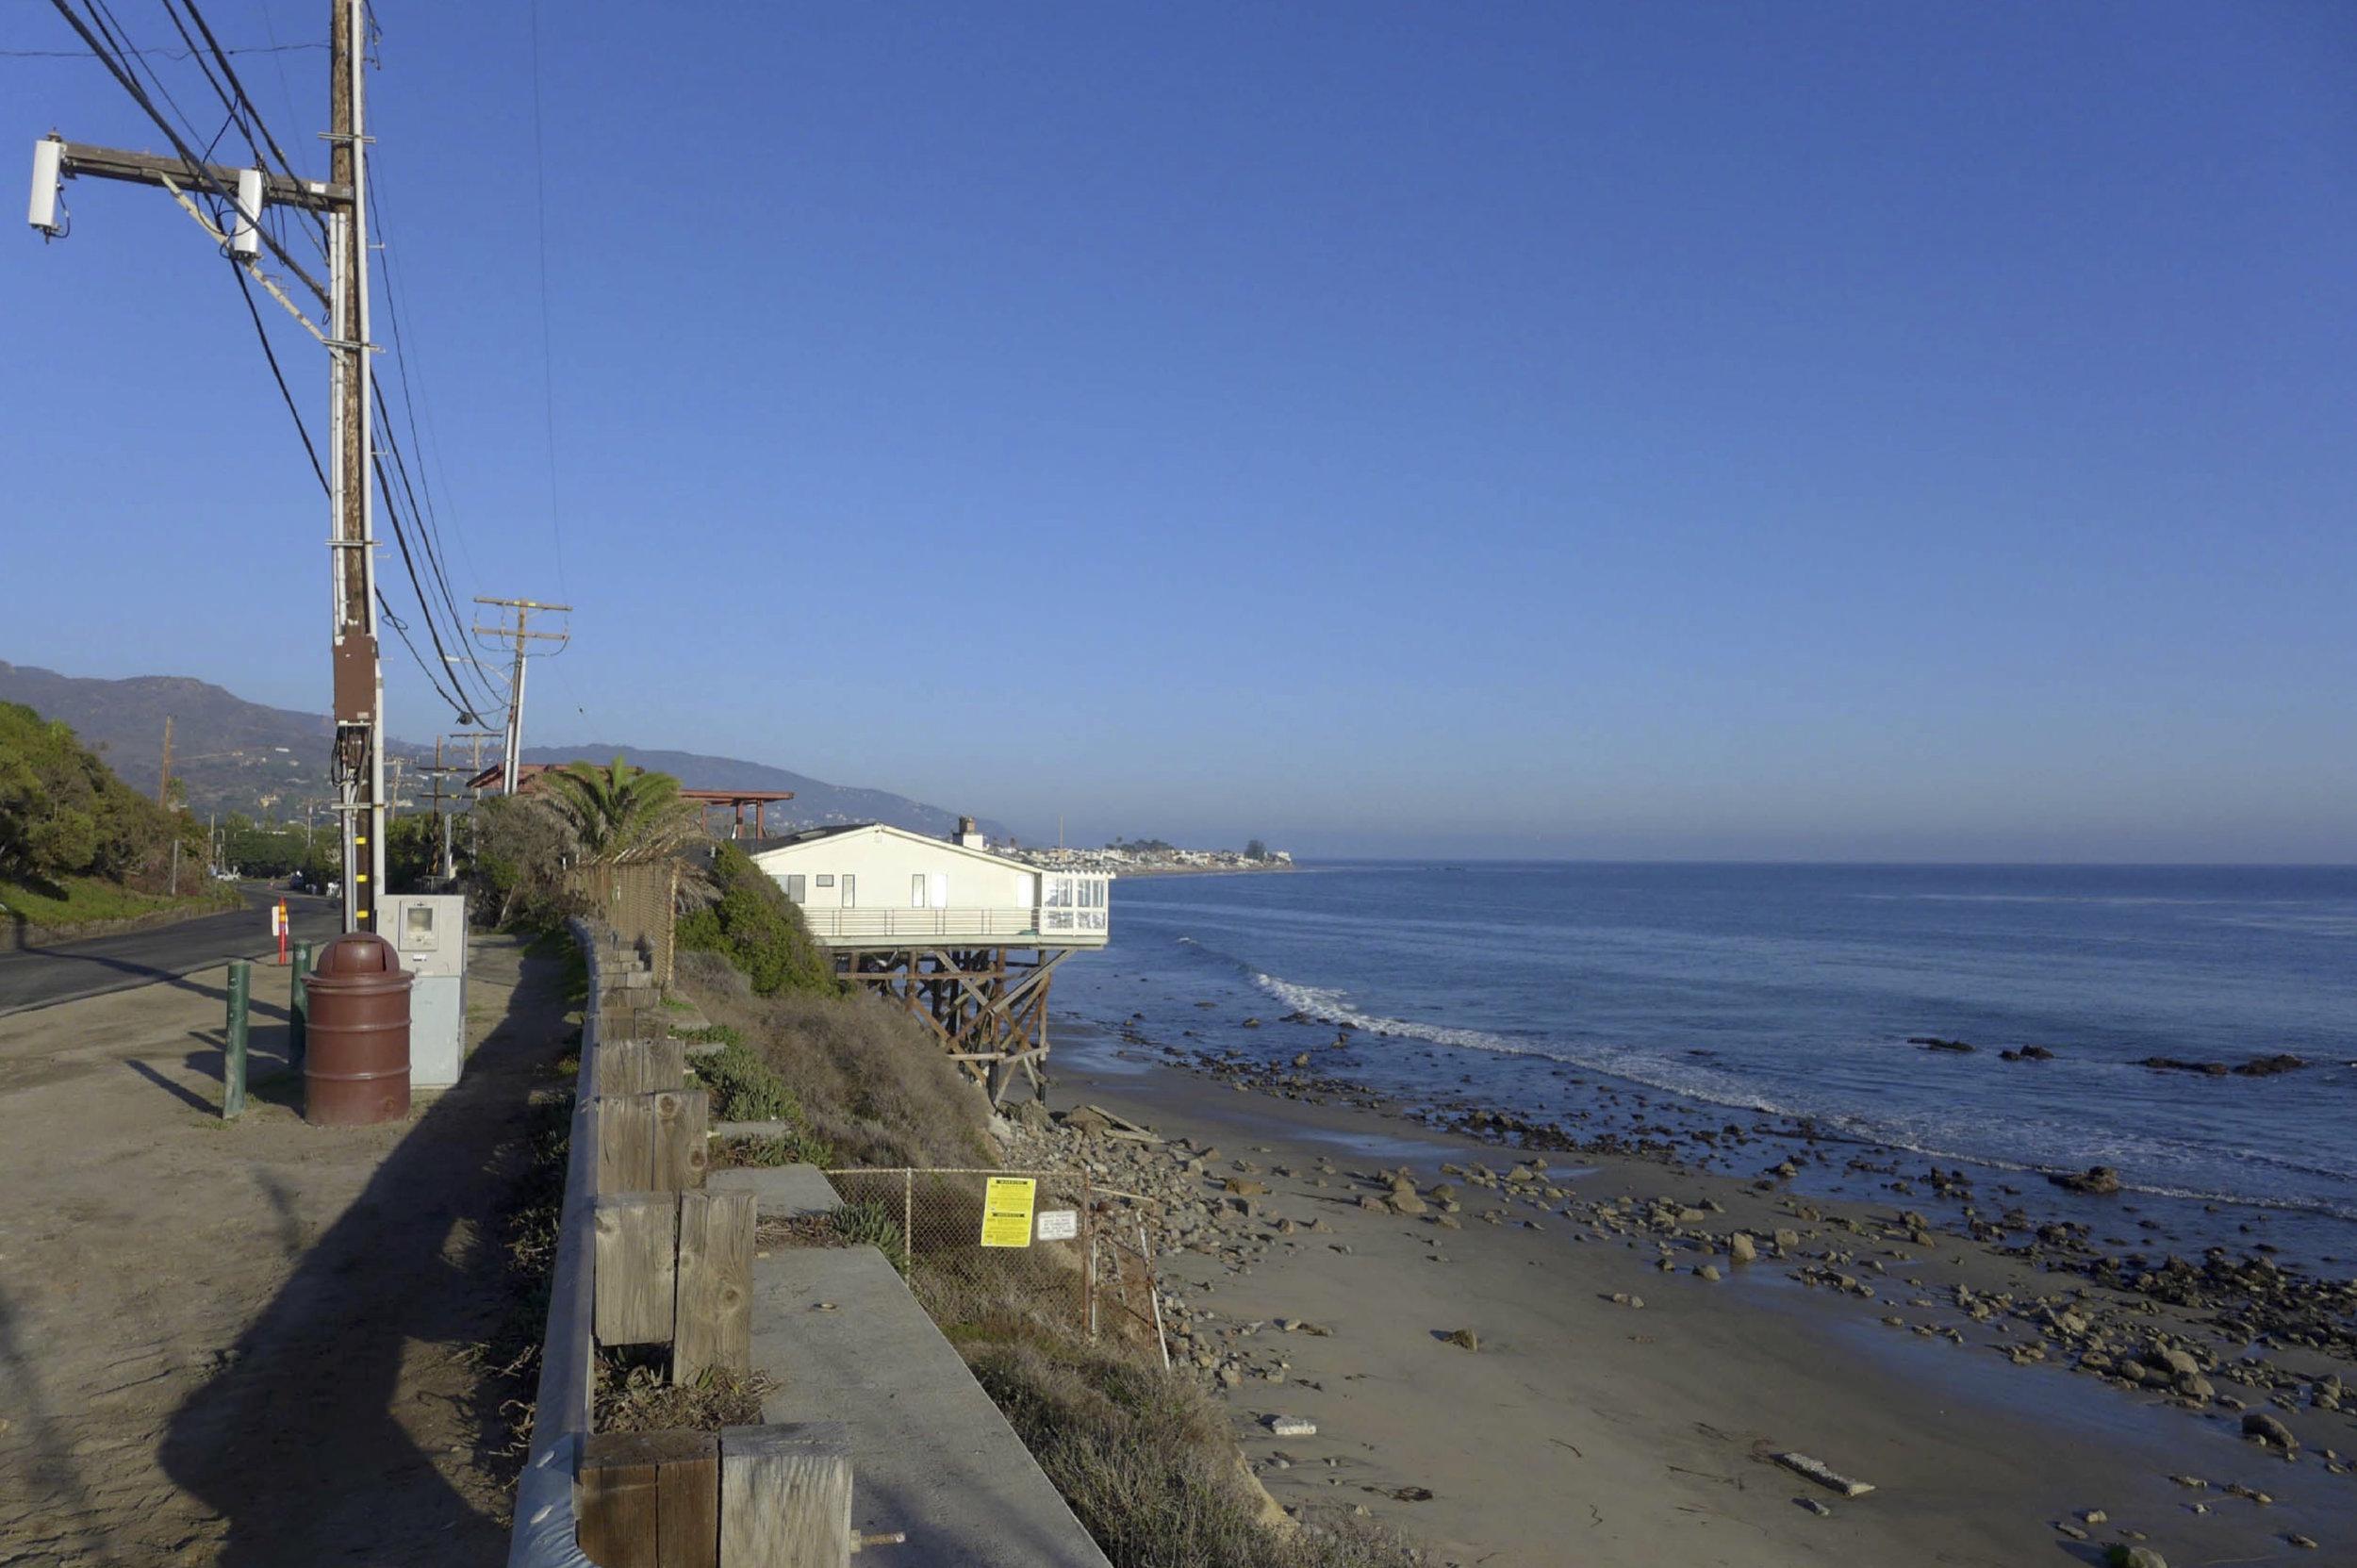 006 view study2 24024 Malibu Road Land For Sale.jpeg